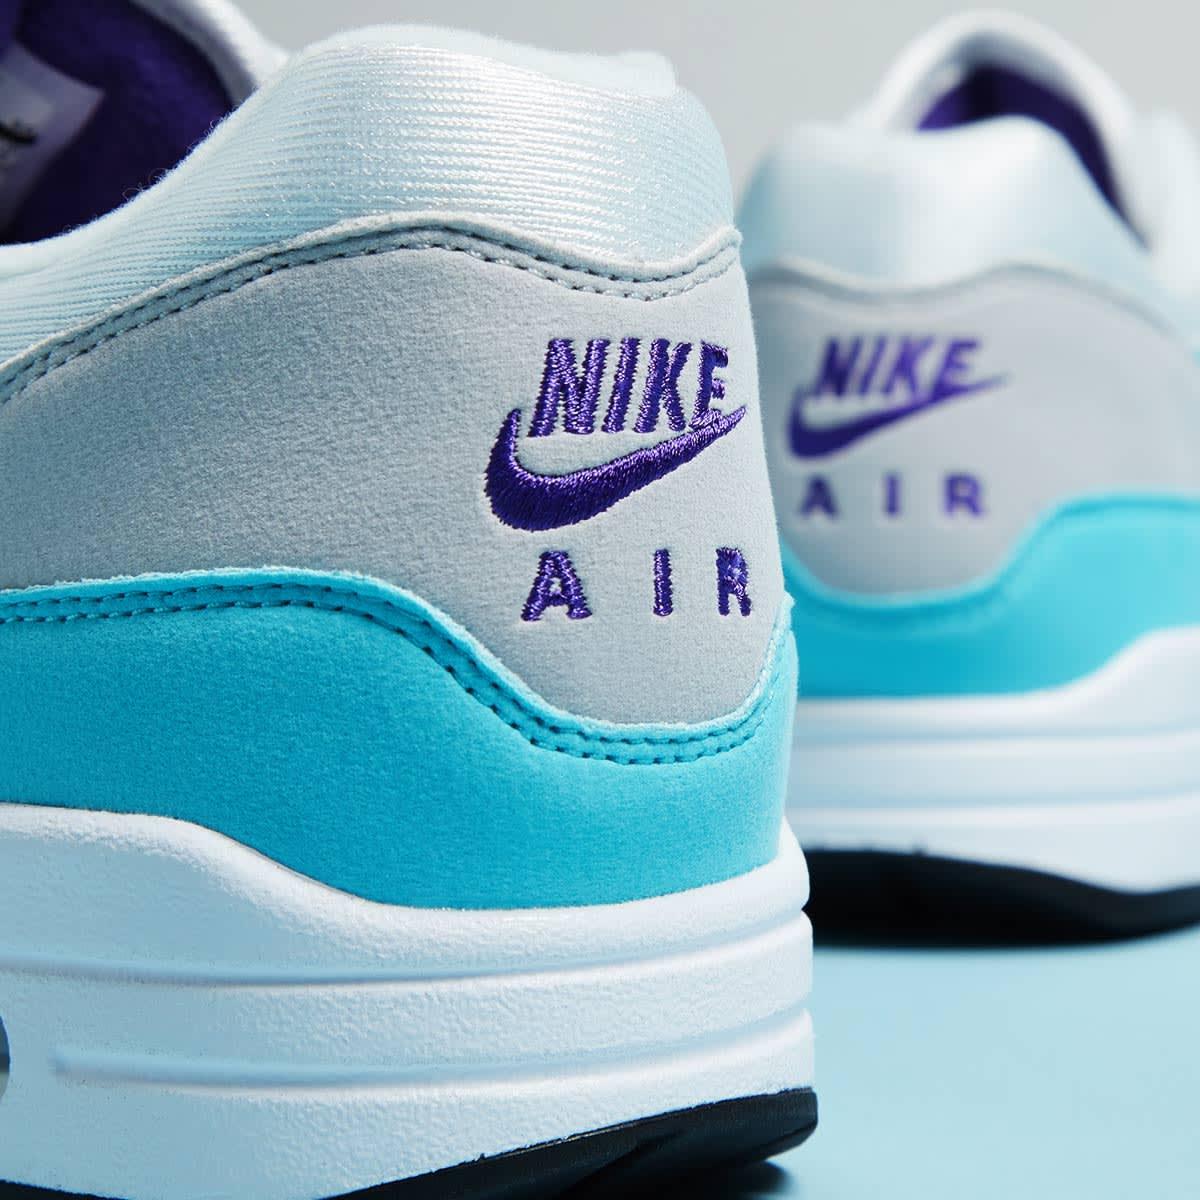 Nike Air Max 1 Anniversary (White, Aqua & Grey)